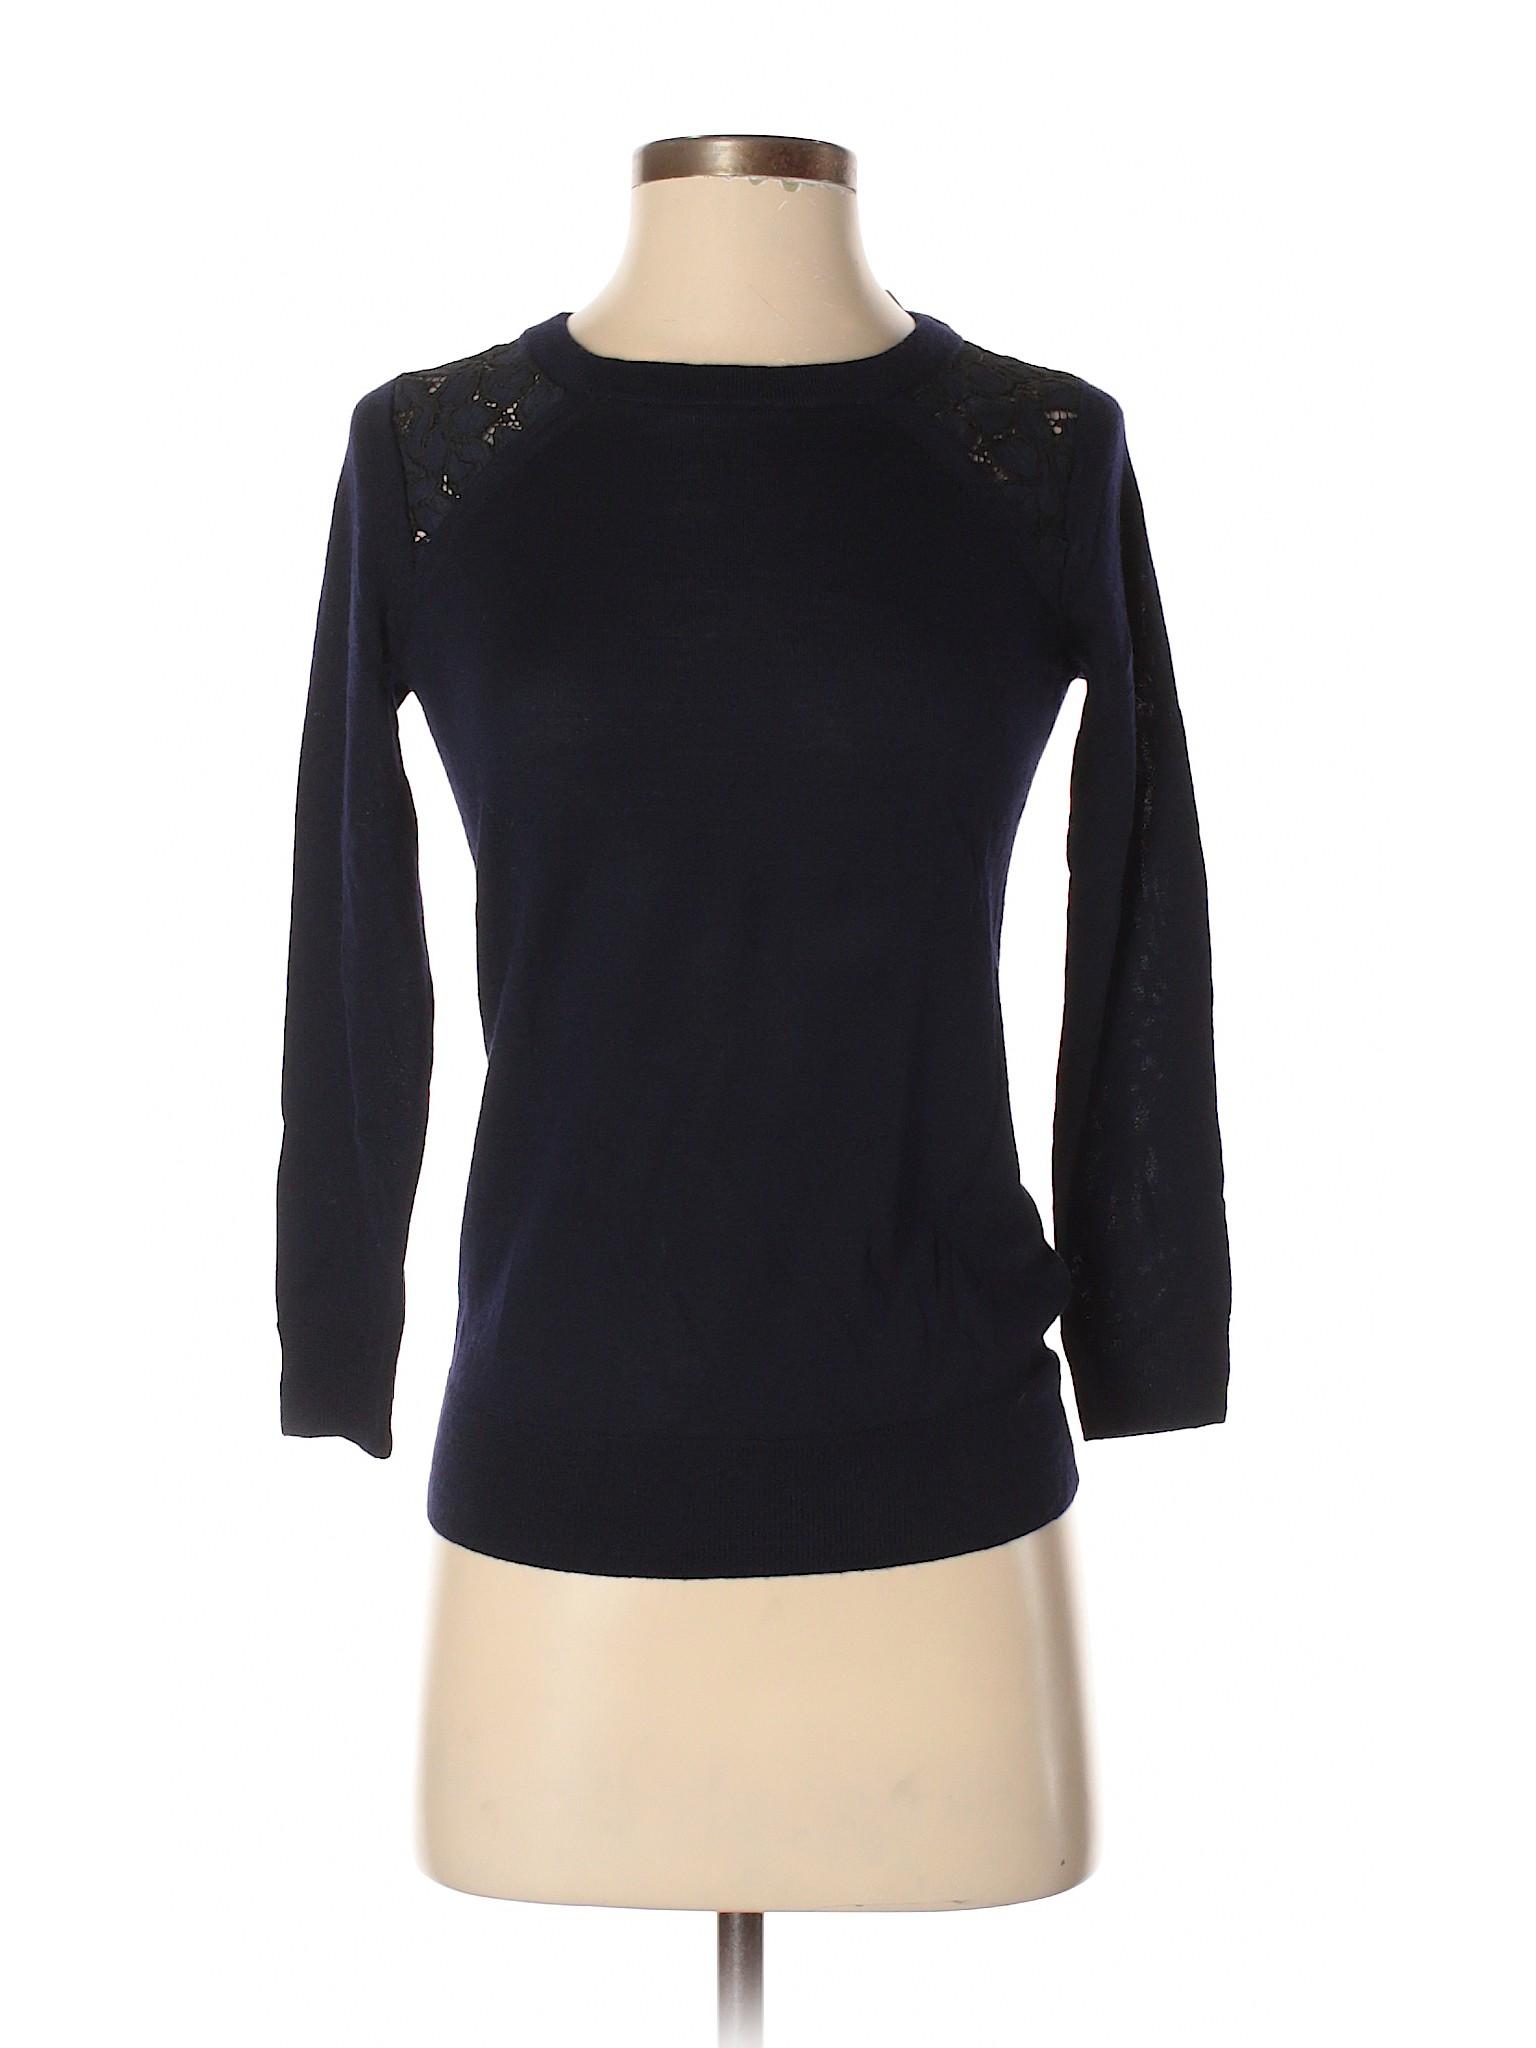 Wool Pullover Sweater Boutique Crew J EwE8U